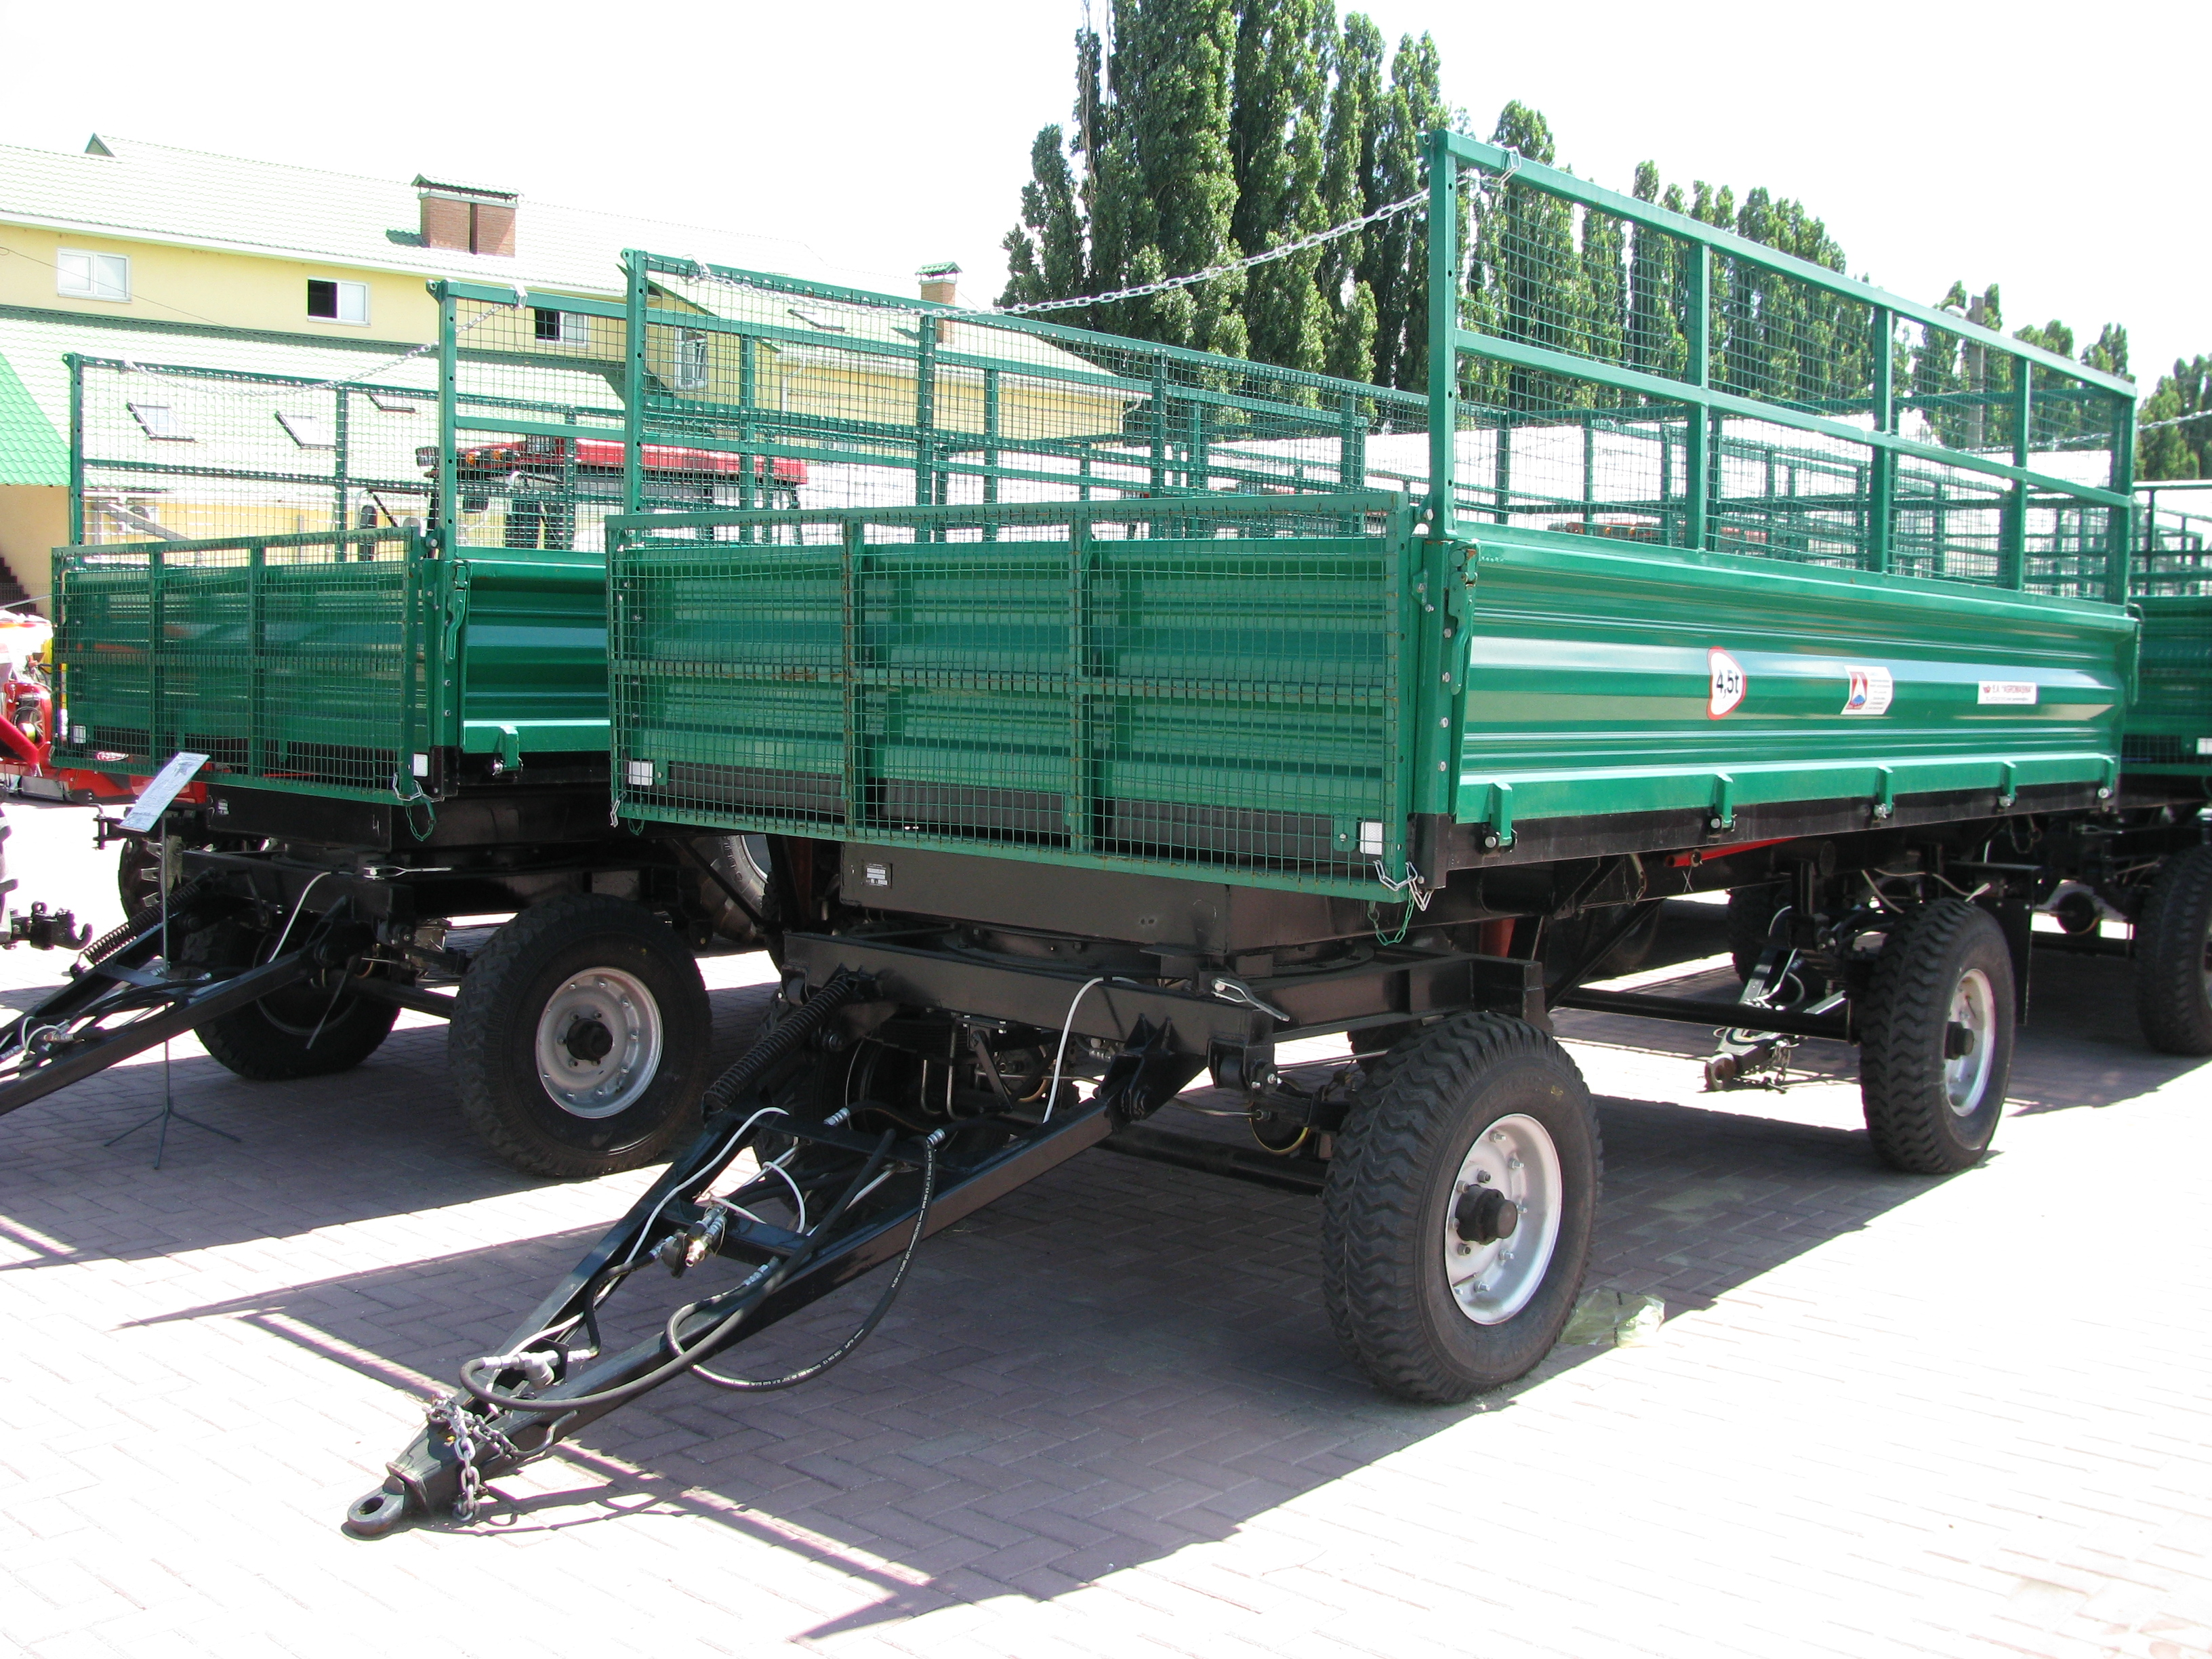 Remorca  agricola pentru tractor                2PTS-4.5 - Image 3